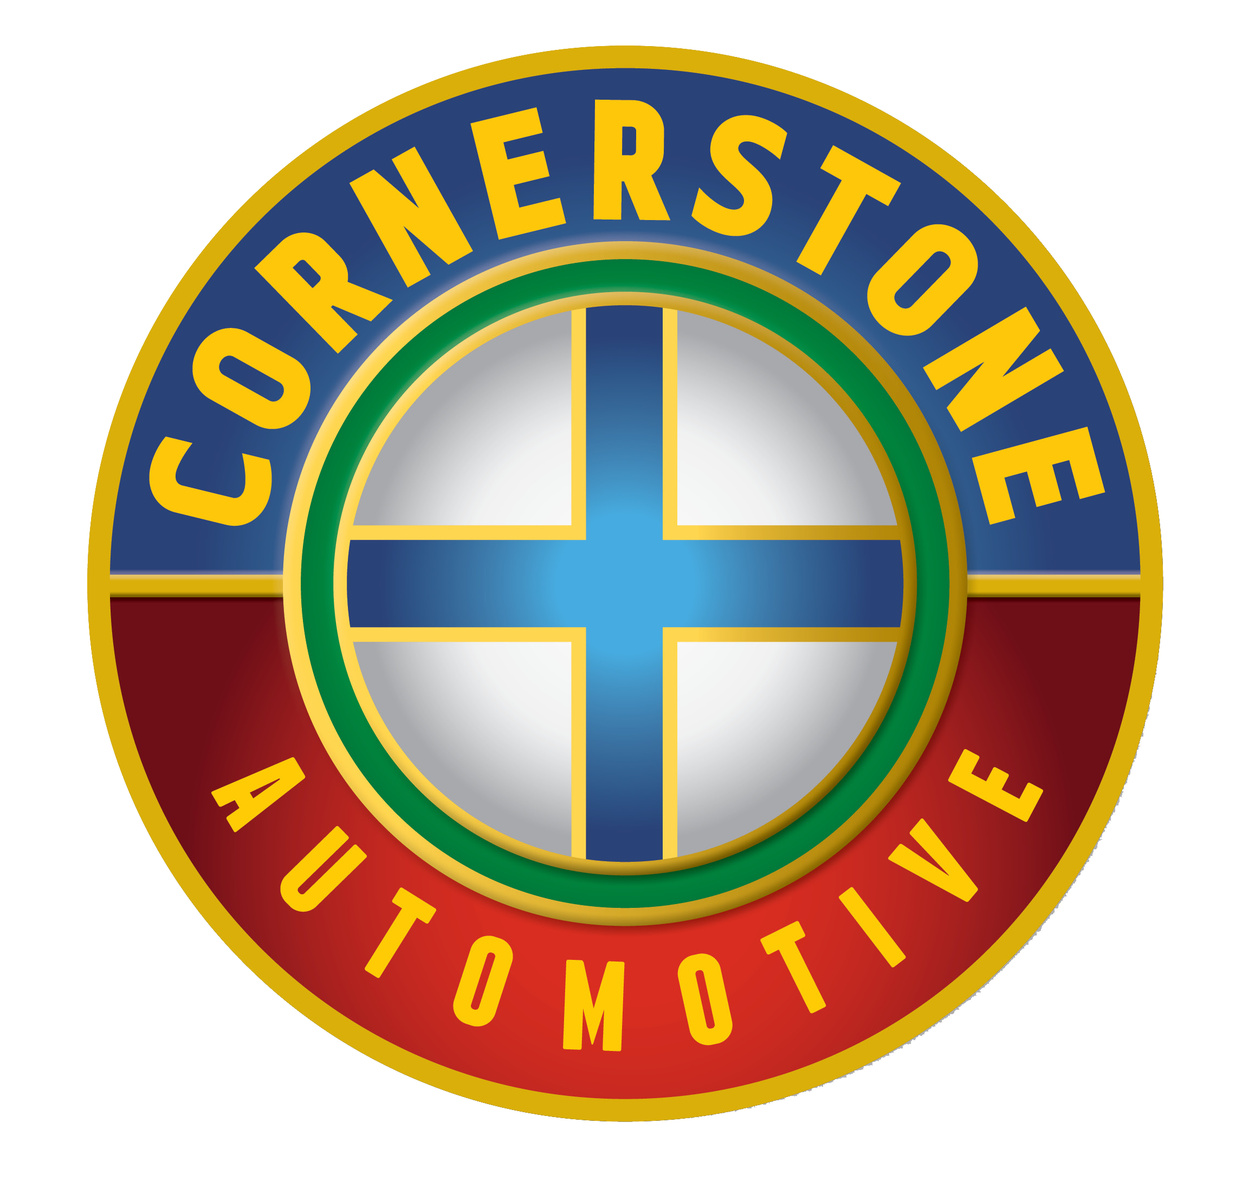 Cornerstone Ford Elk River Mn Read Consumer Reviews